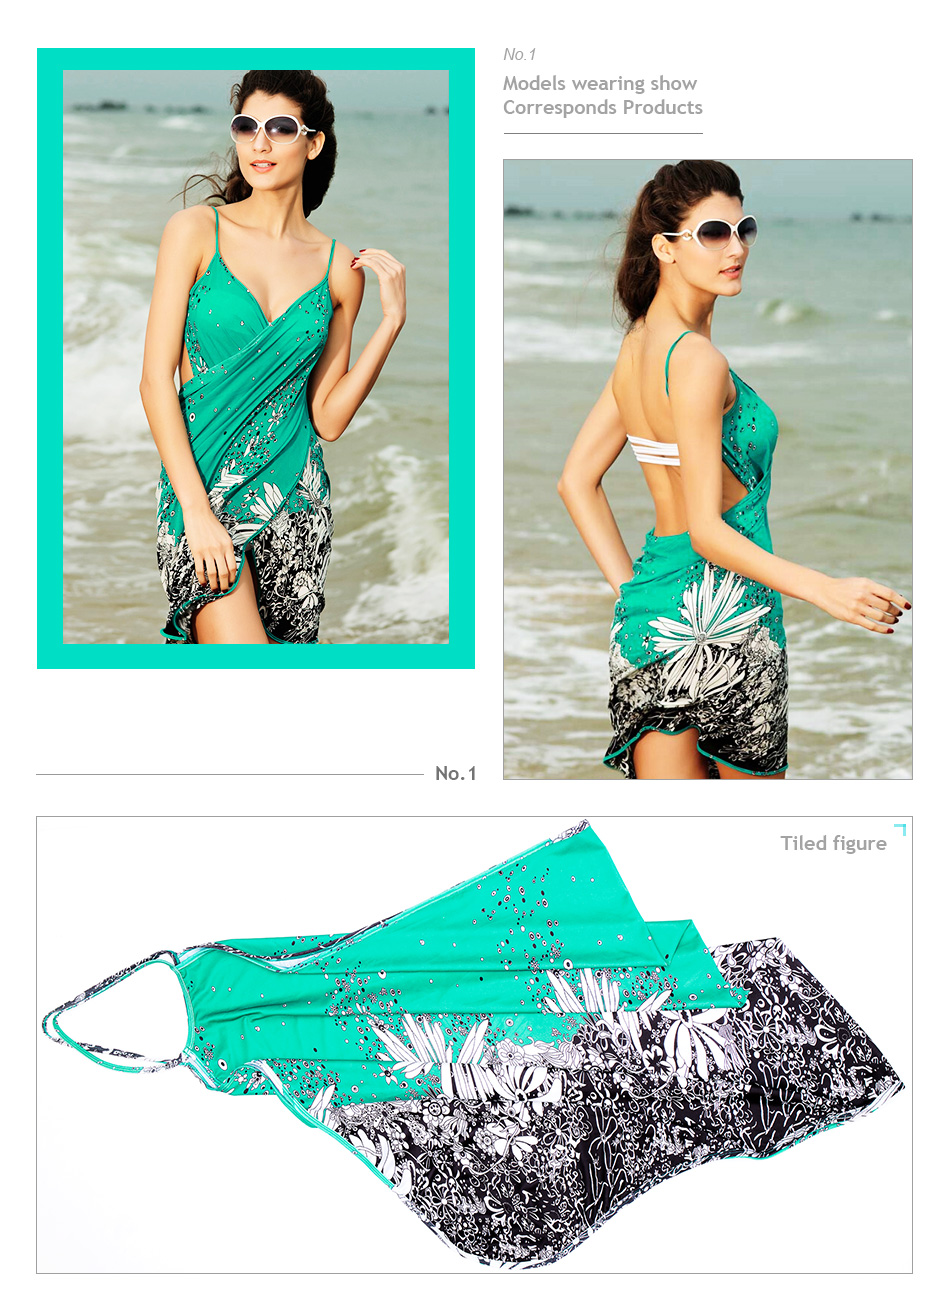 bb30c0d84b4de Blue 8619079209_1856230565 Beach Bikini Cover Up Holiday Beachwear Women  Beach Dress Sexy Summer White Chiffon Vestido 2019 Sarong ...